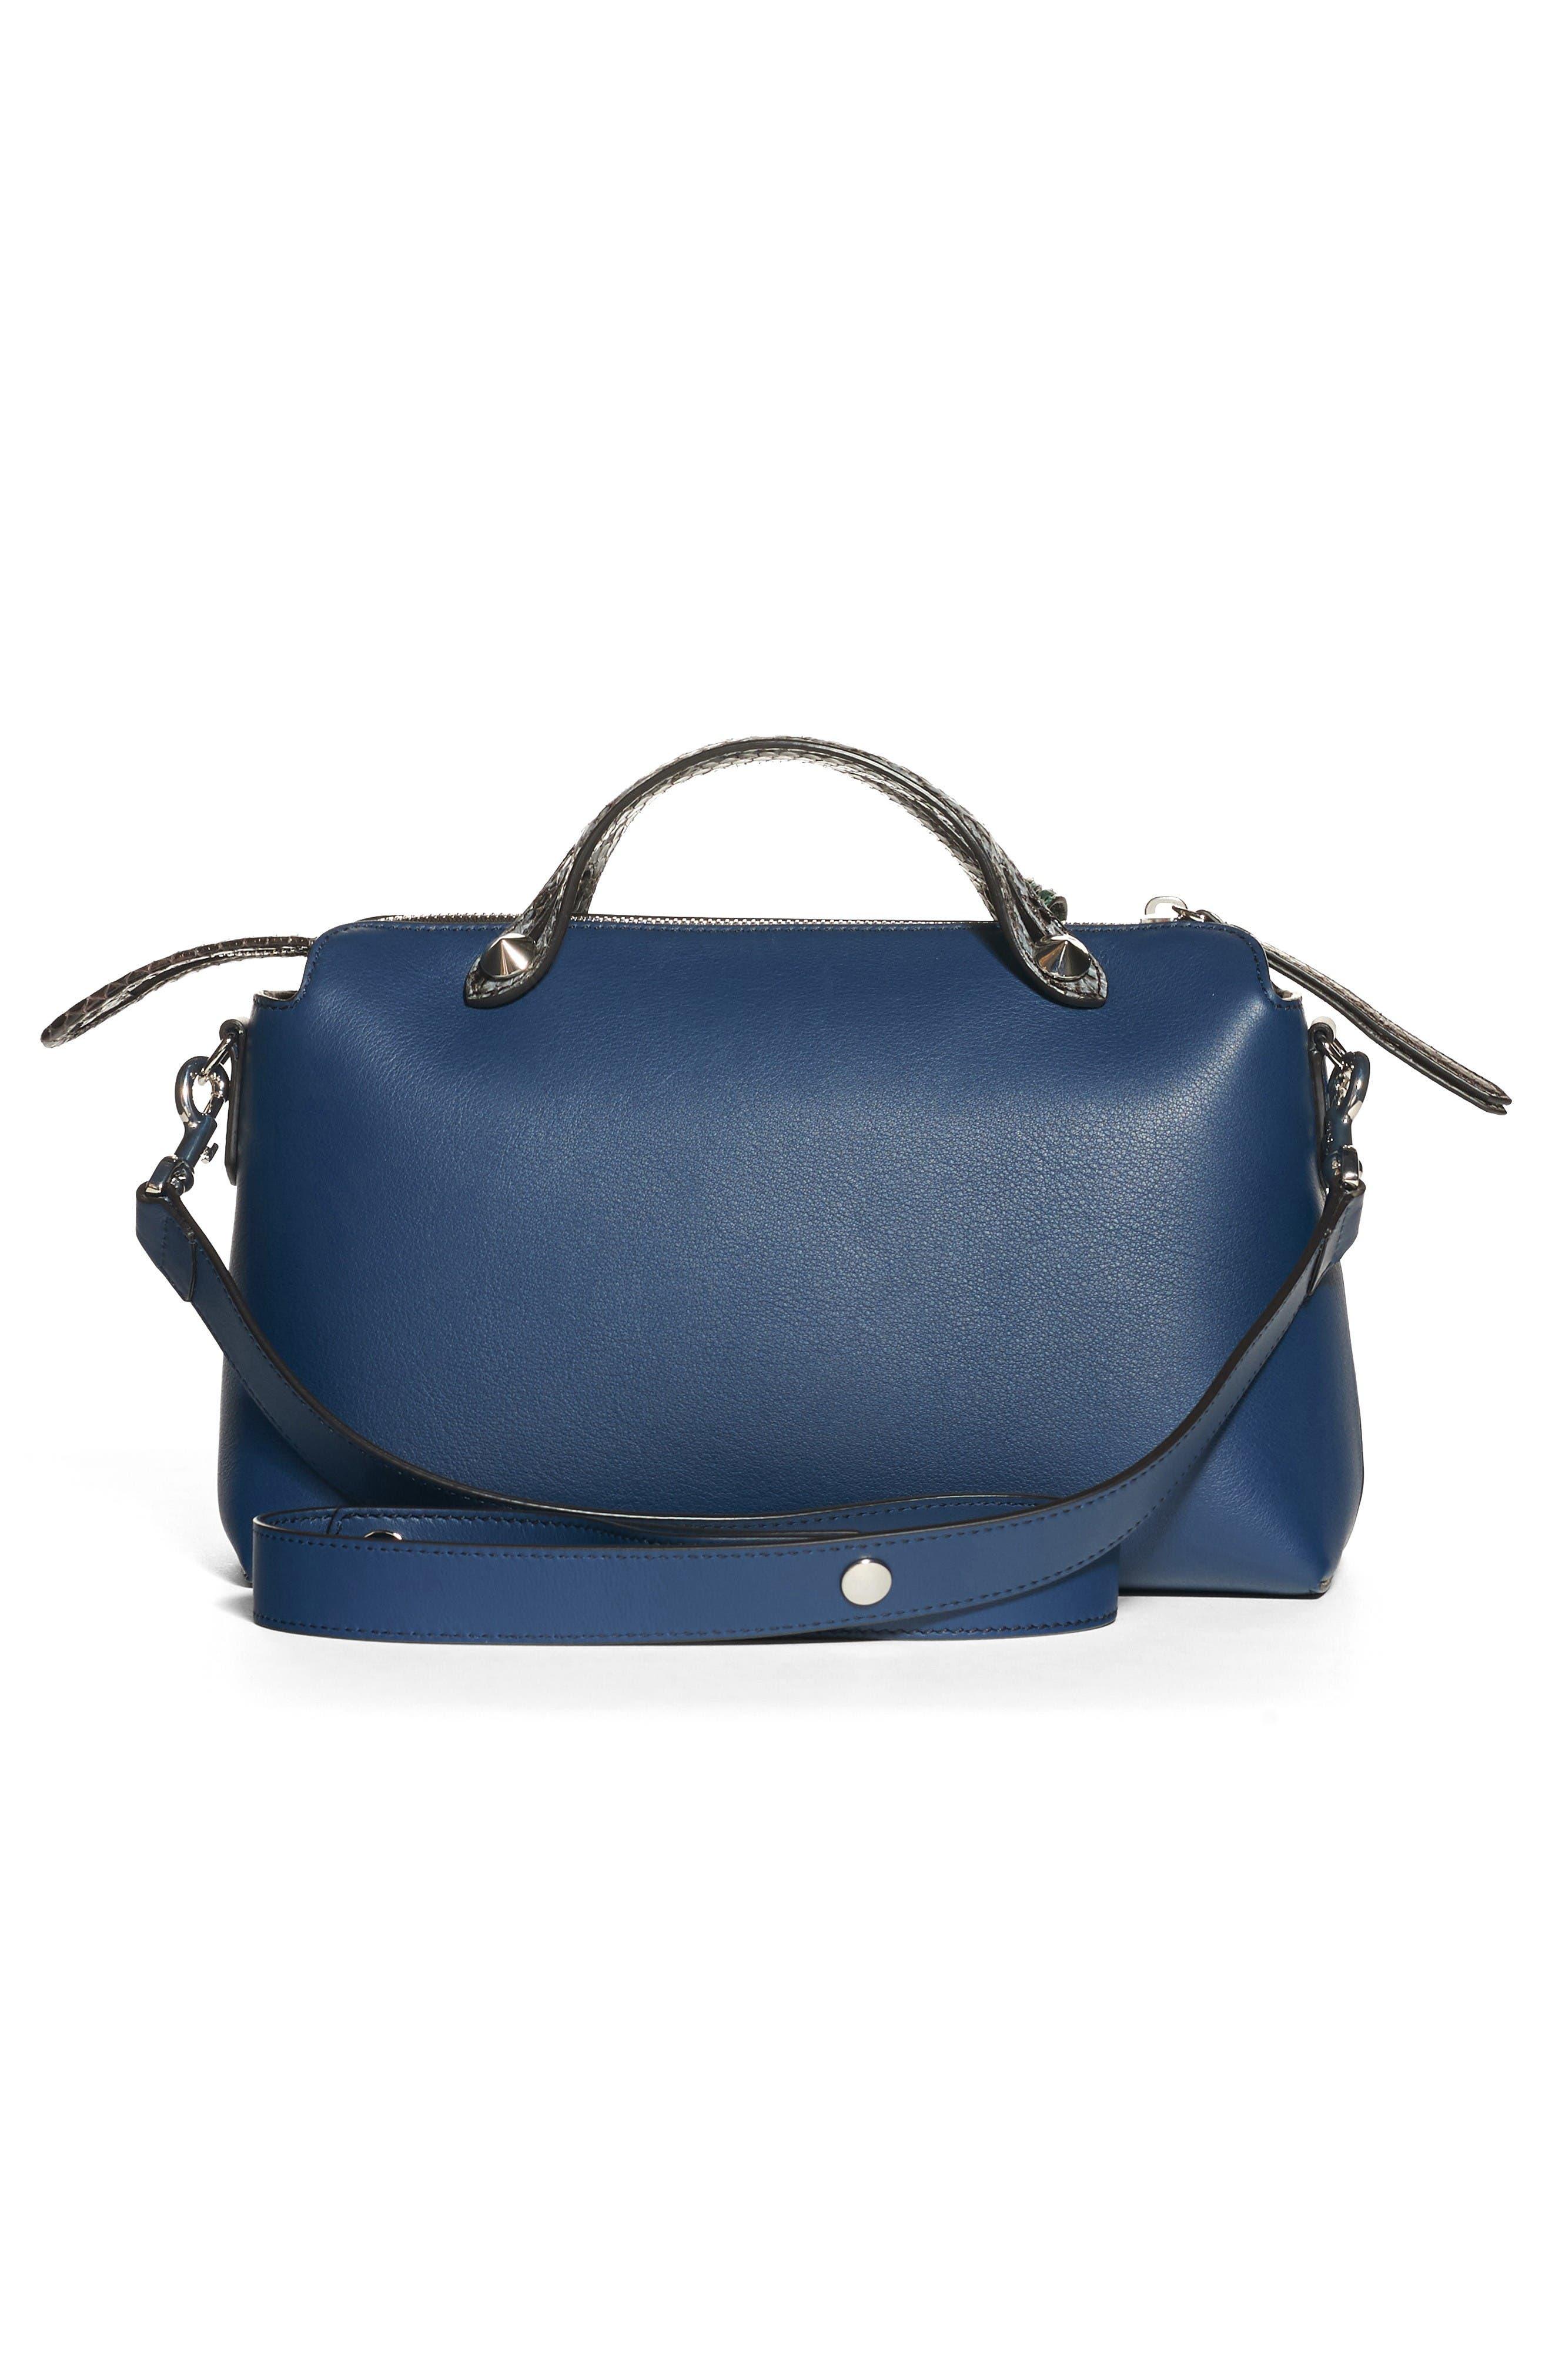 Alternate Image 2  - Fendi 'Medium By the Way' Calfskin Leather Shoulder Bag with Genuine Snakeskin Trim